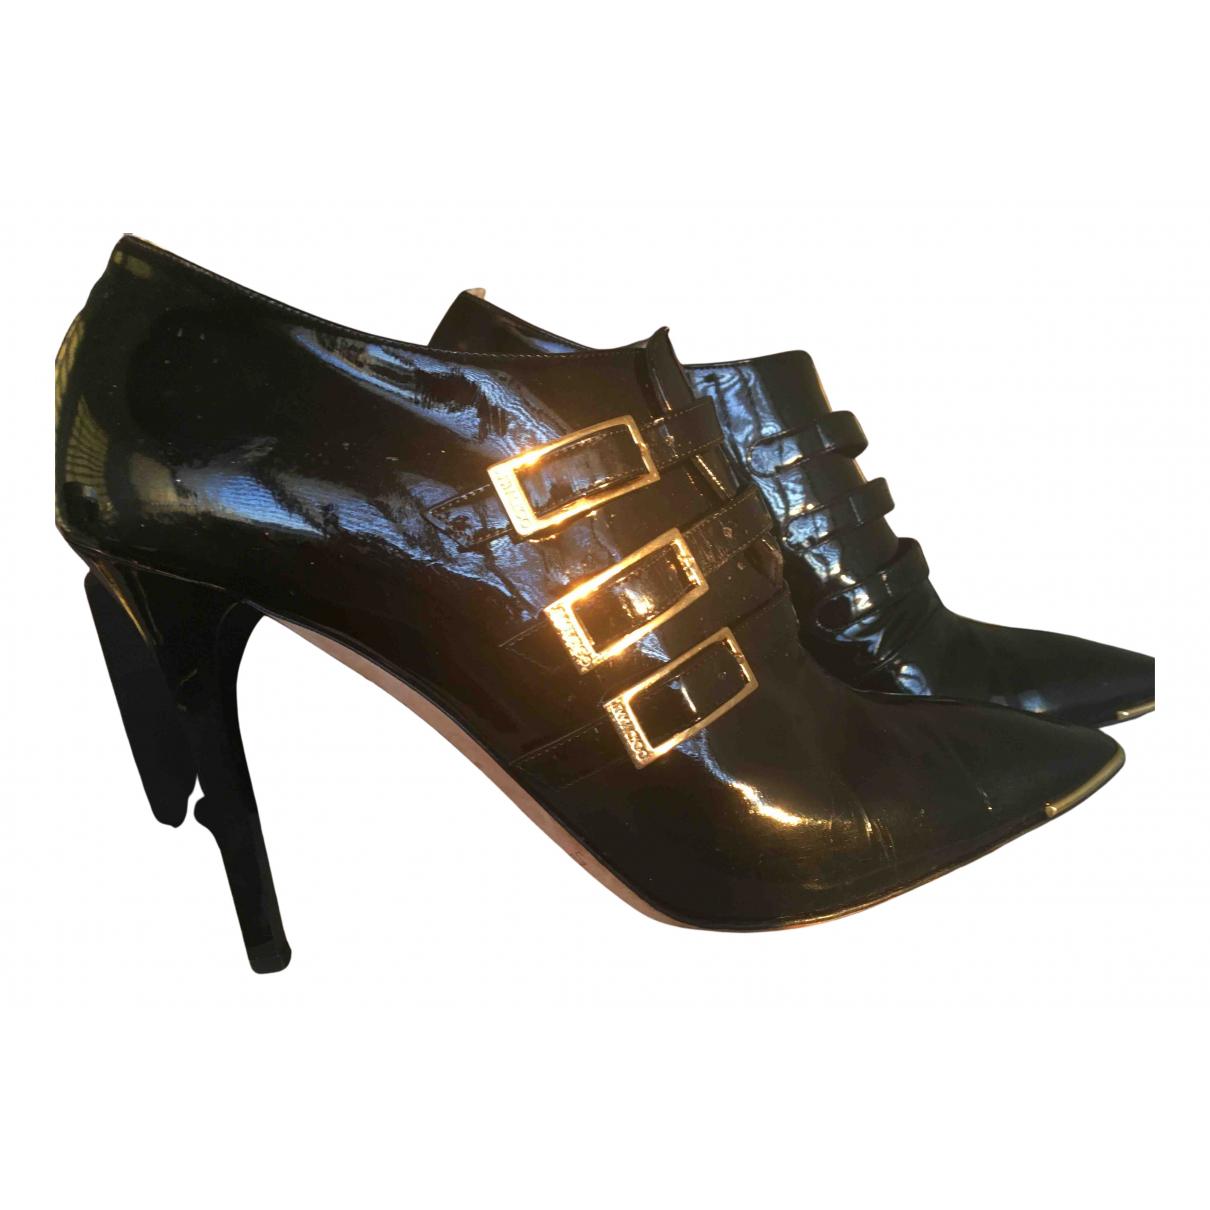 Jimmy Choo N Black Patent leather Heels for Women 40 EU